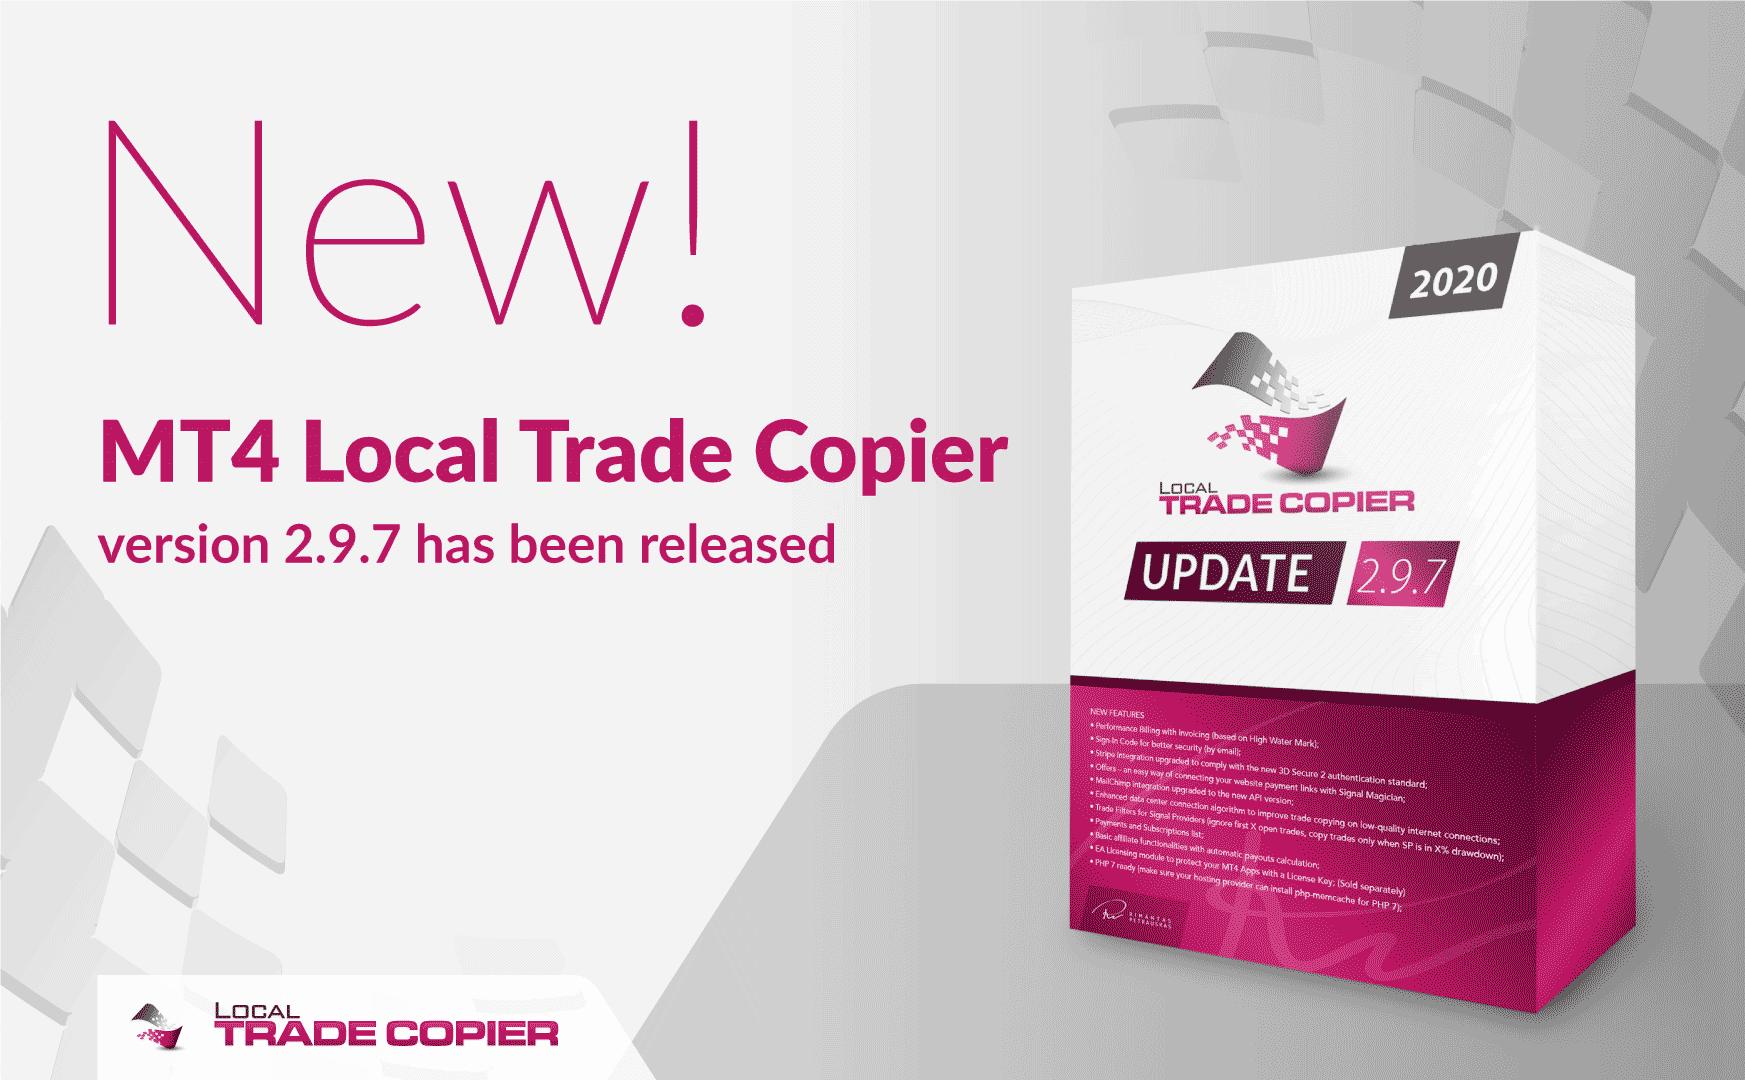 New MT4 Local Trade Copier version 2.9.7 has been released